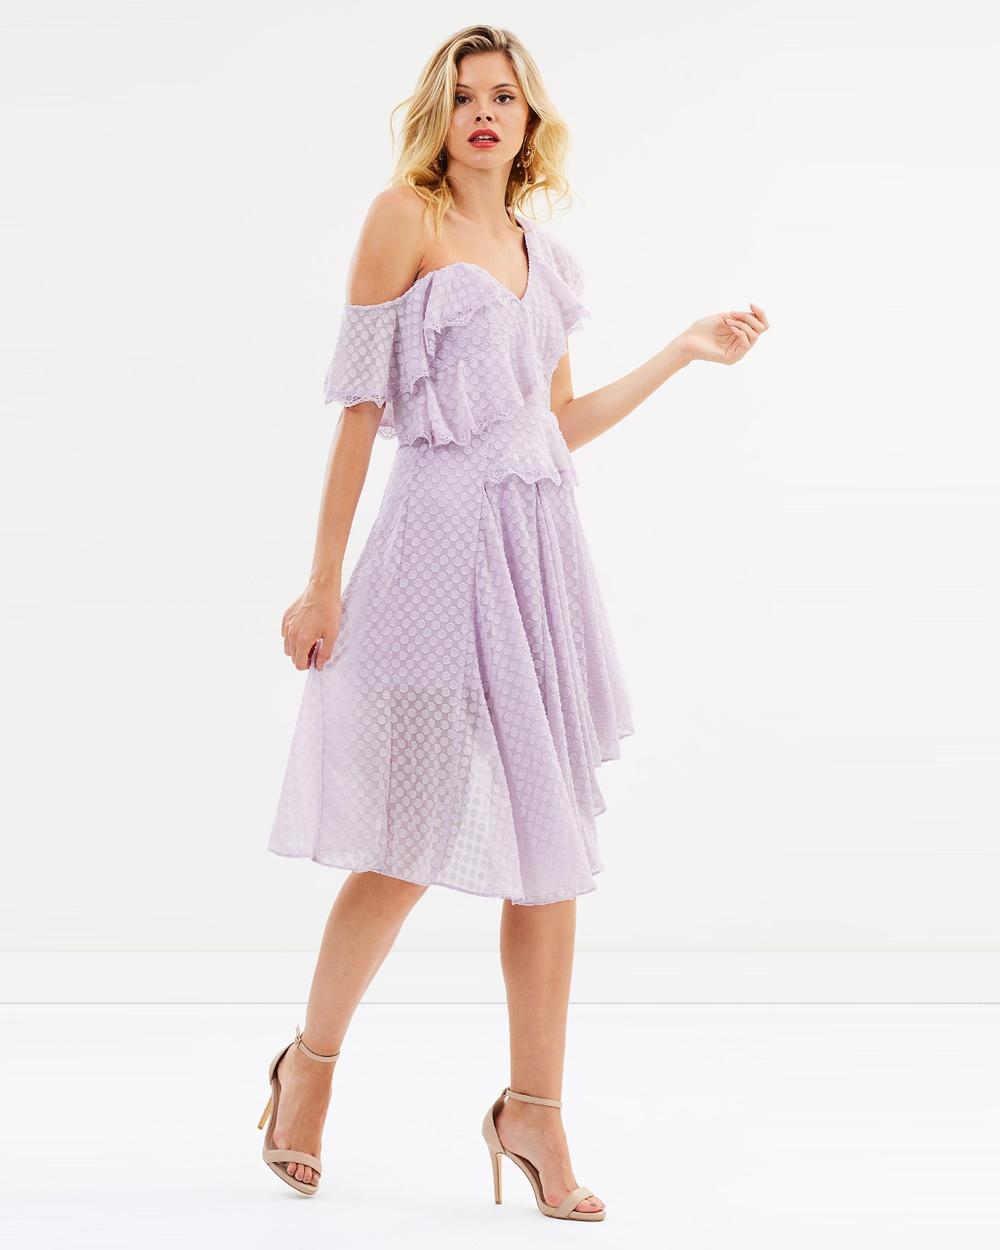 Bardot Senorita Dress Dresses Lilac Mist Senorita Dress